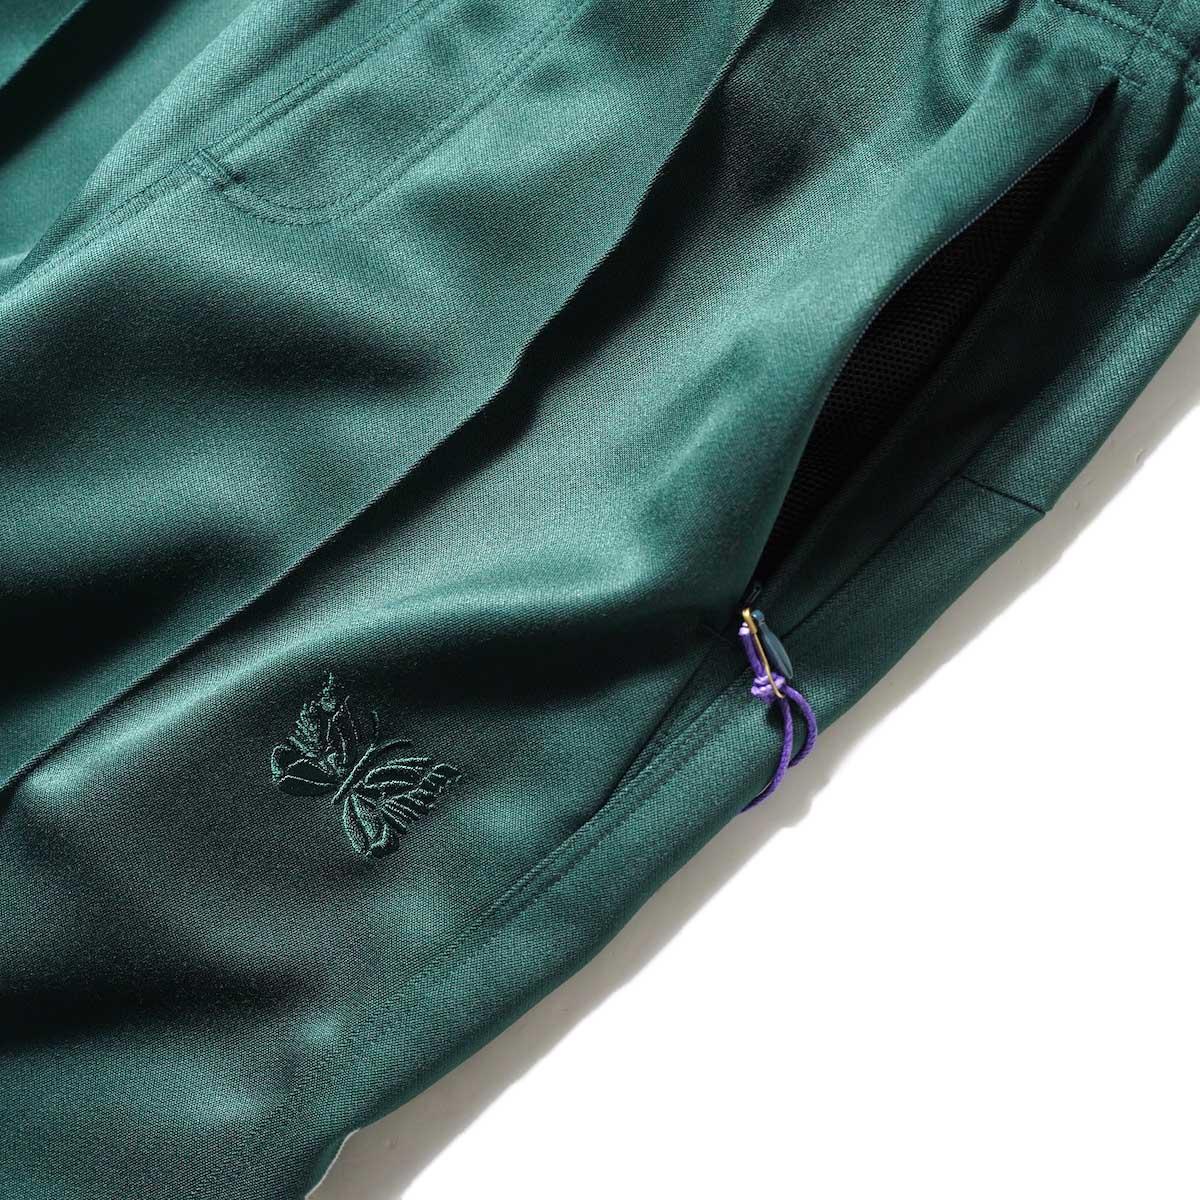 Needles / W.U. BOOT-CUT PANT - PE/R DOESKIN (Green)サイドポケット